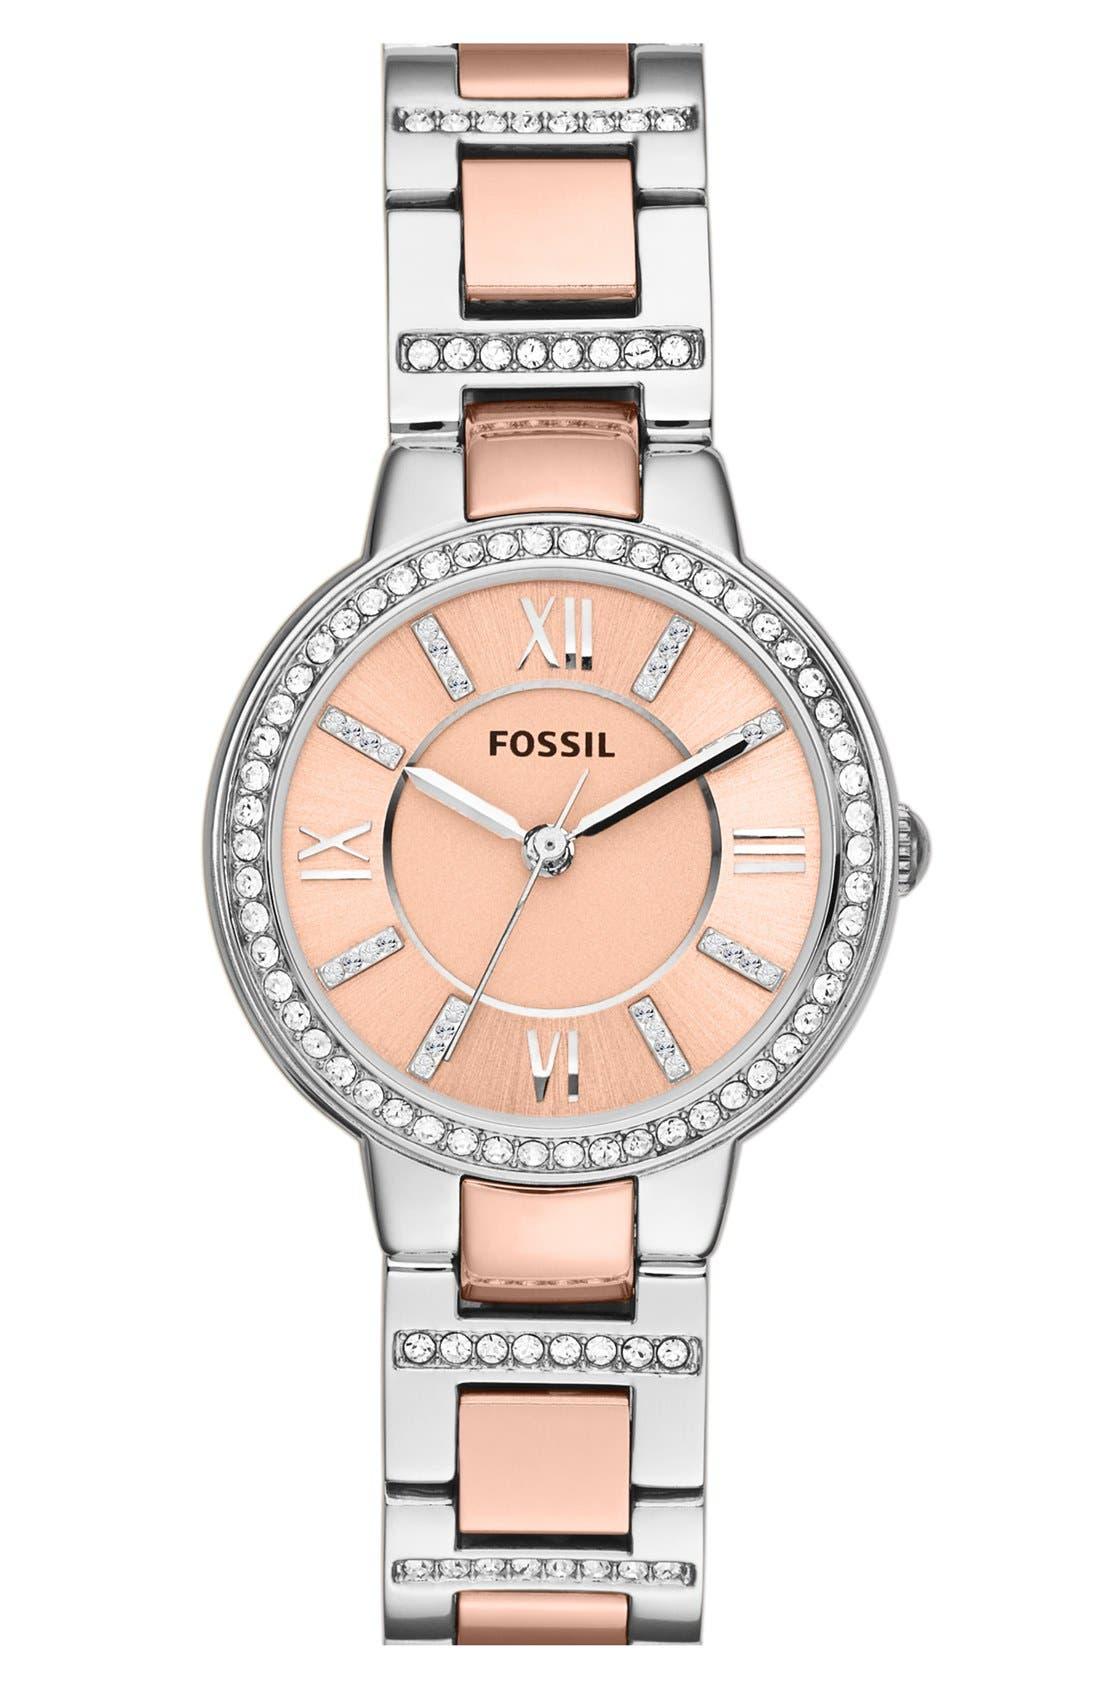 FOSSIL 'Virginia' Crystal Bezel Bracelet Watch, 30mm, Main, color, ROSE GOLD/ SILVER